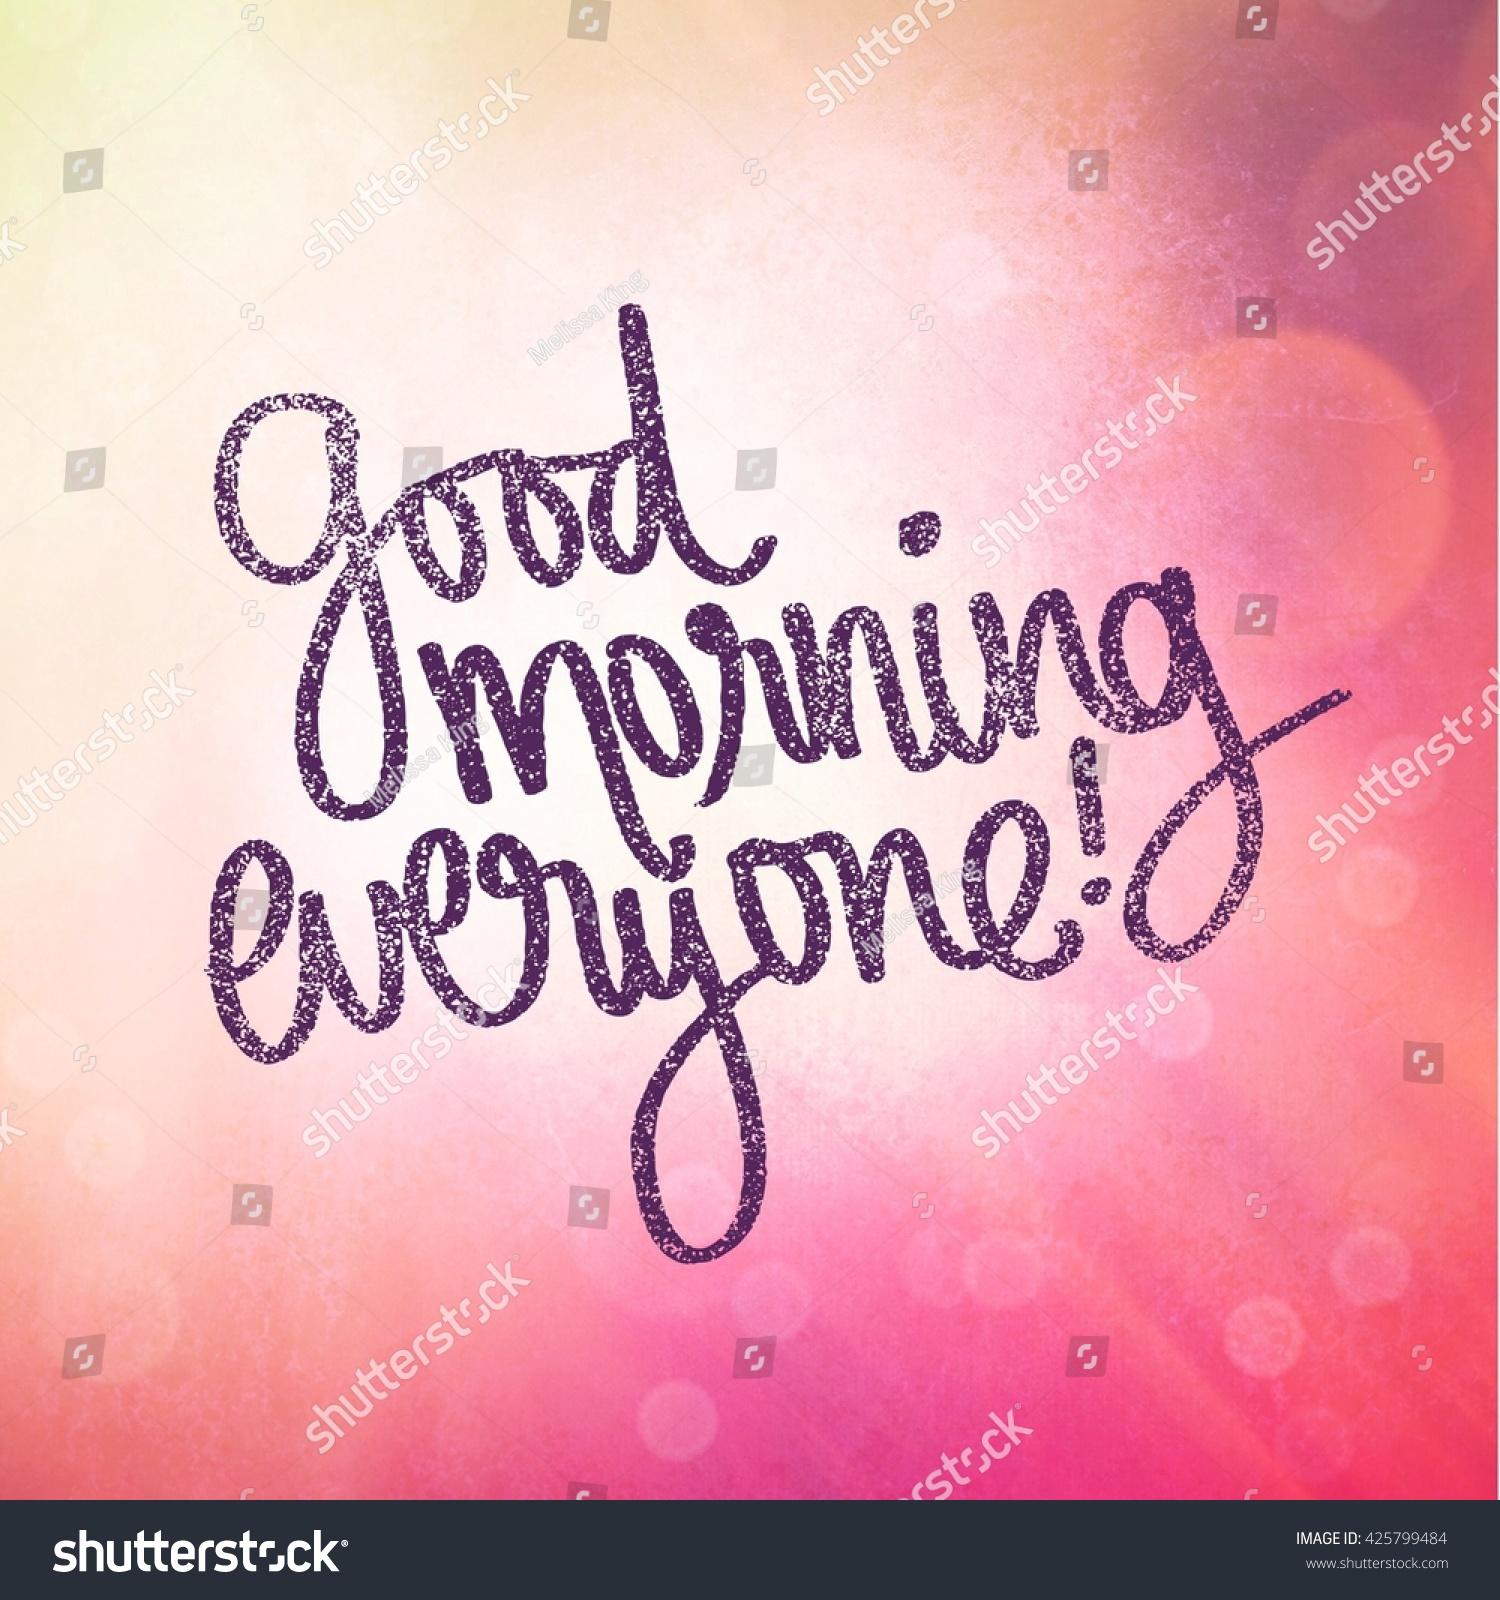 Good Morning Everyone In Español : Good morning everybody in spanish impremedia